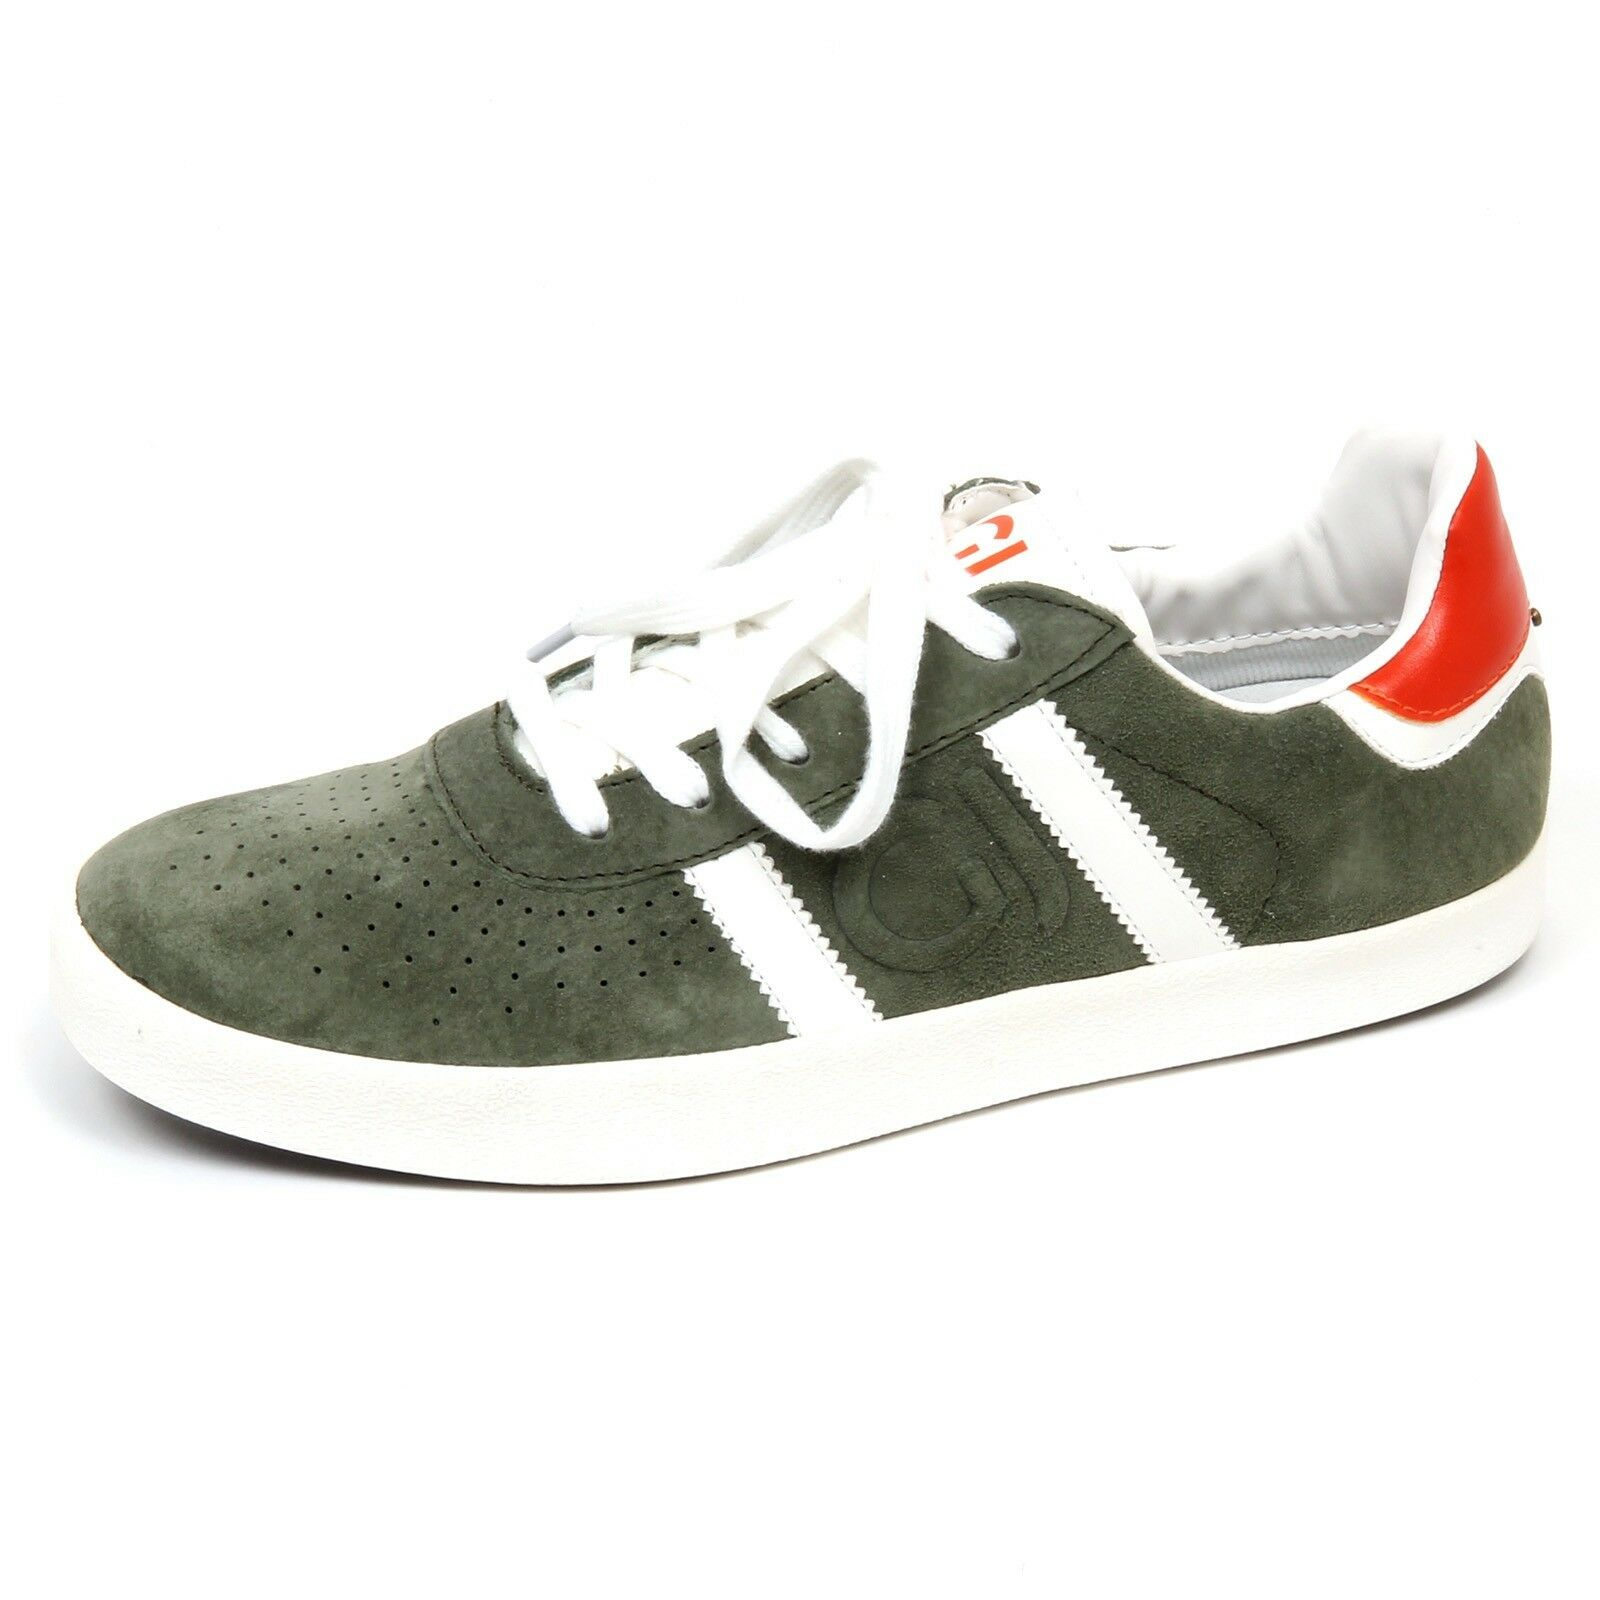 E9558 sneaker uomo green olive GAUDI' man scarpe shoe man GAUDI' aa3d29